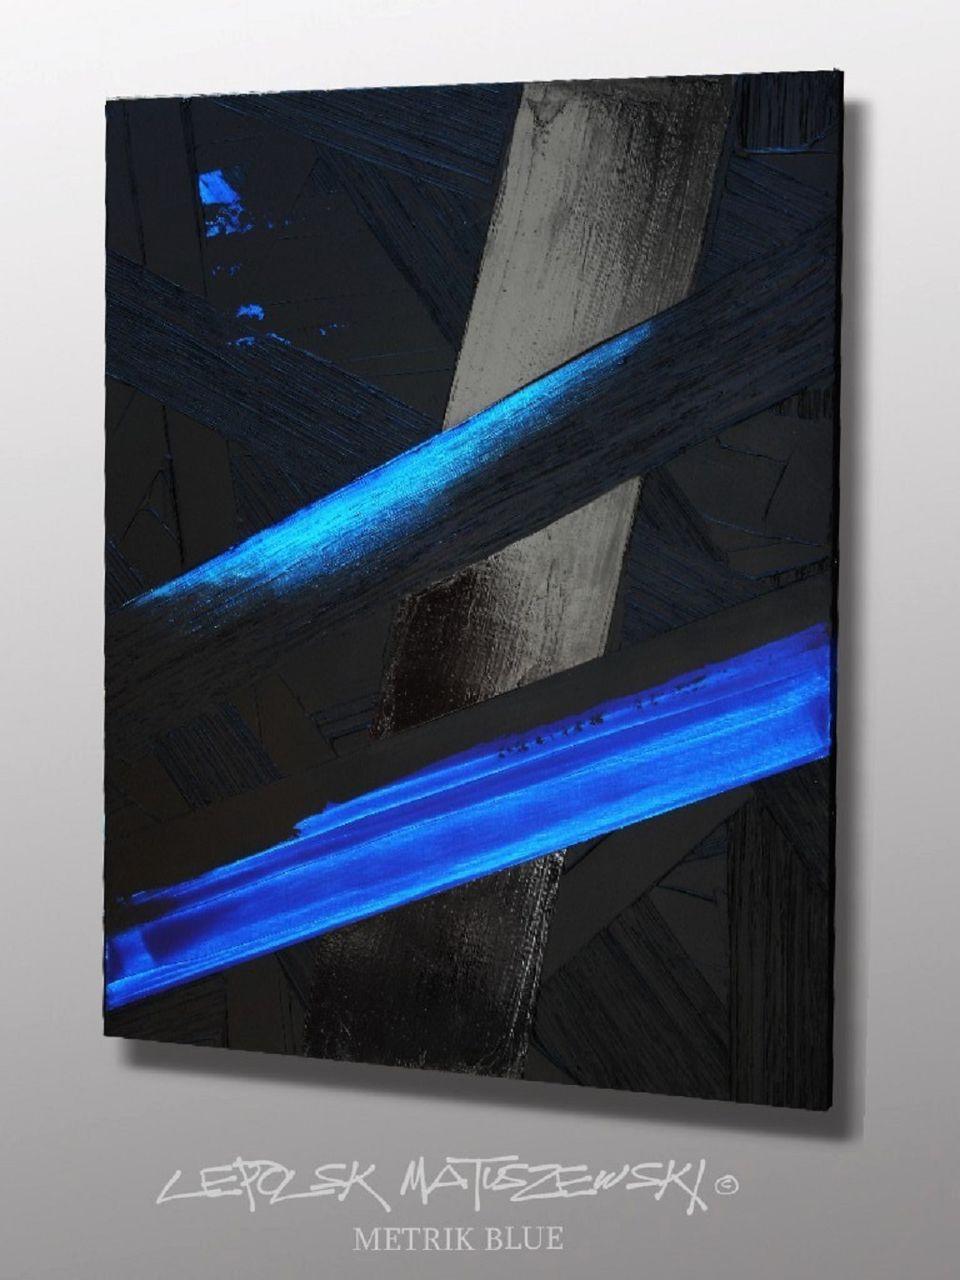 MISTER K  (Lepolsk Matuszewski) METRIK BLUE  expressionnisme abstrait